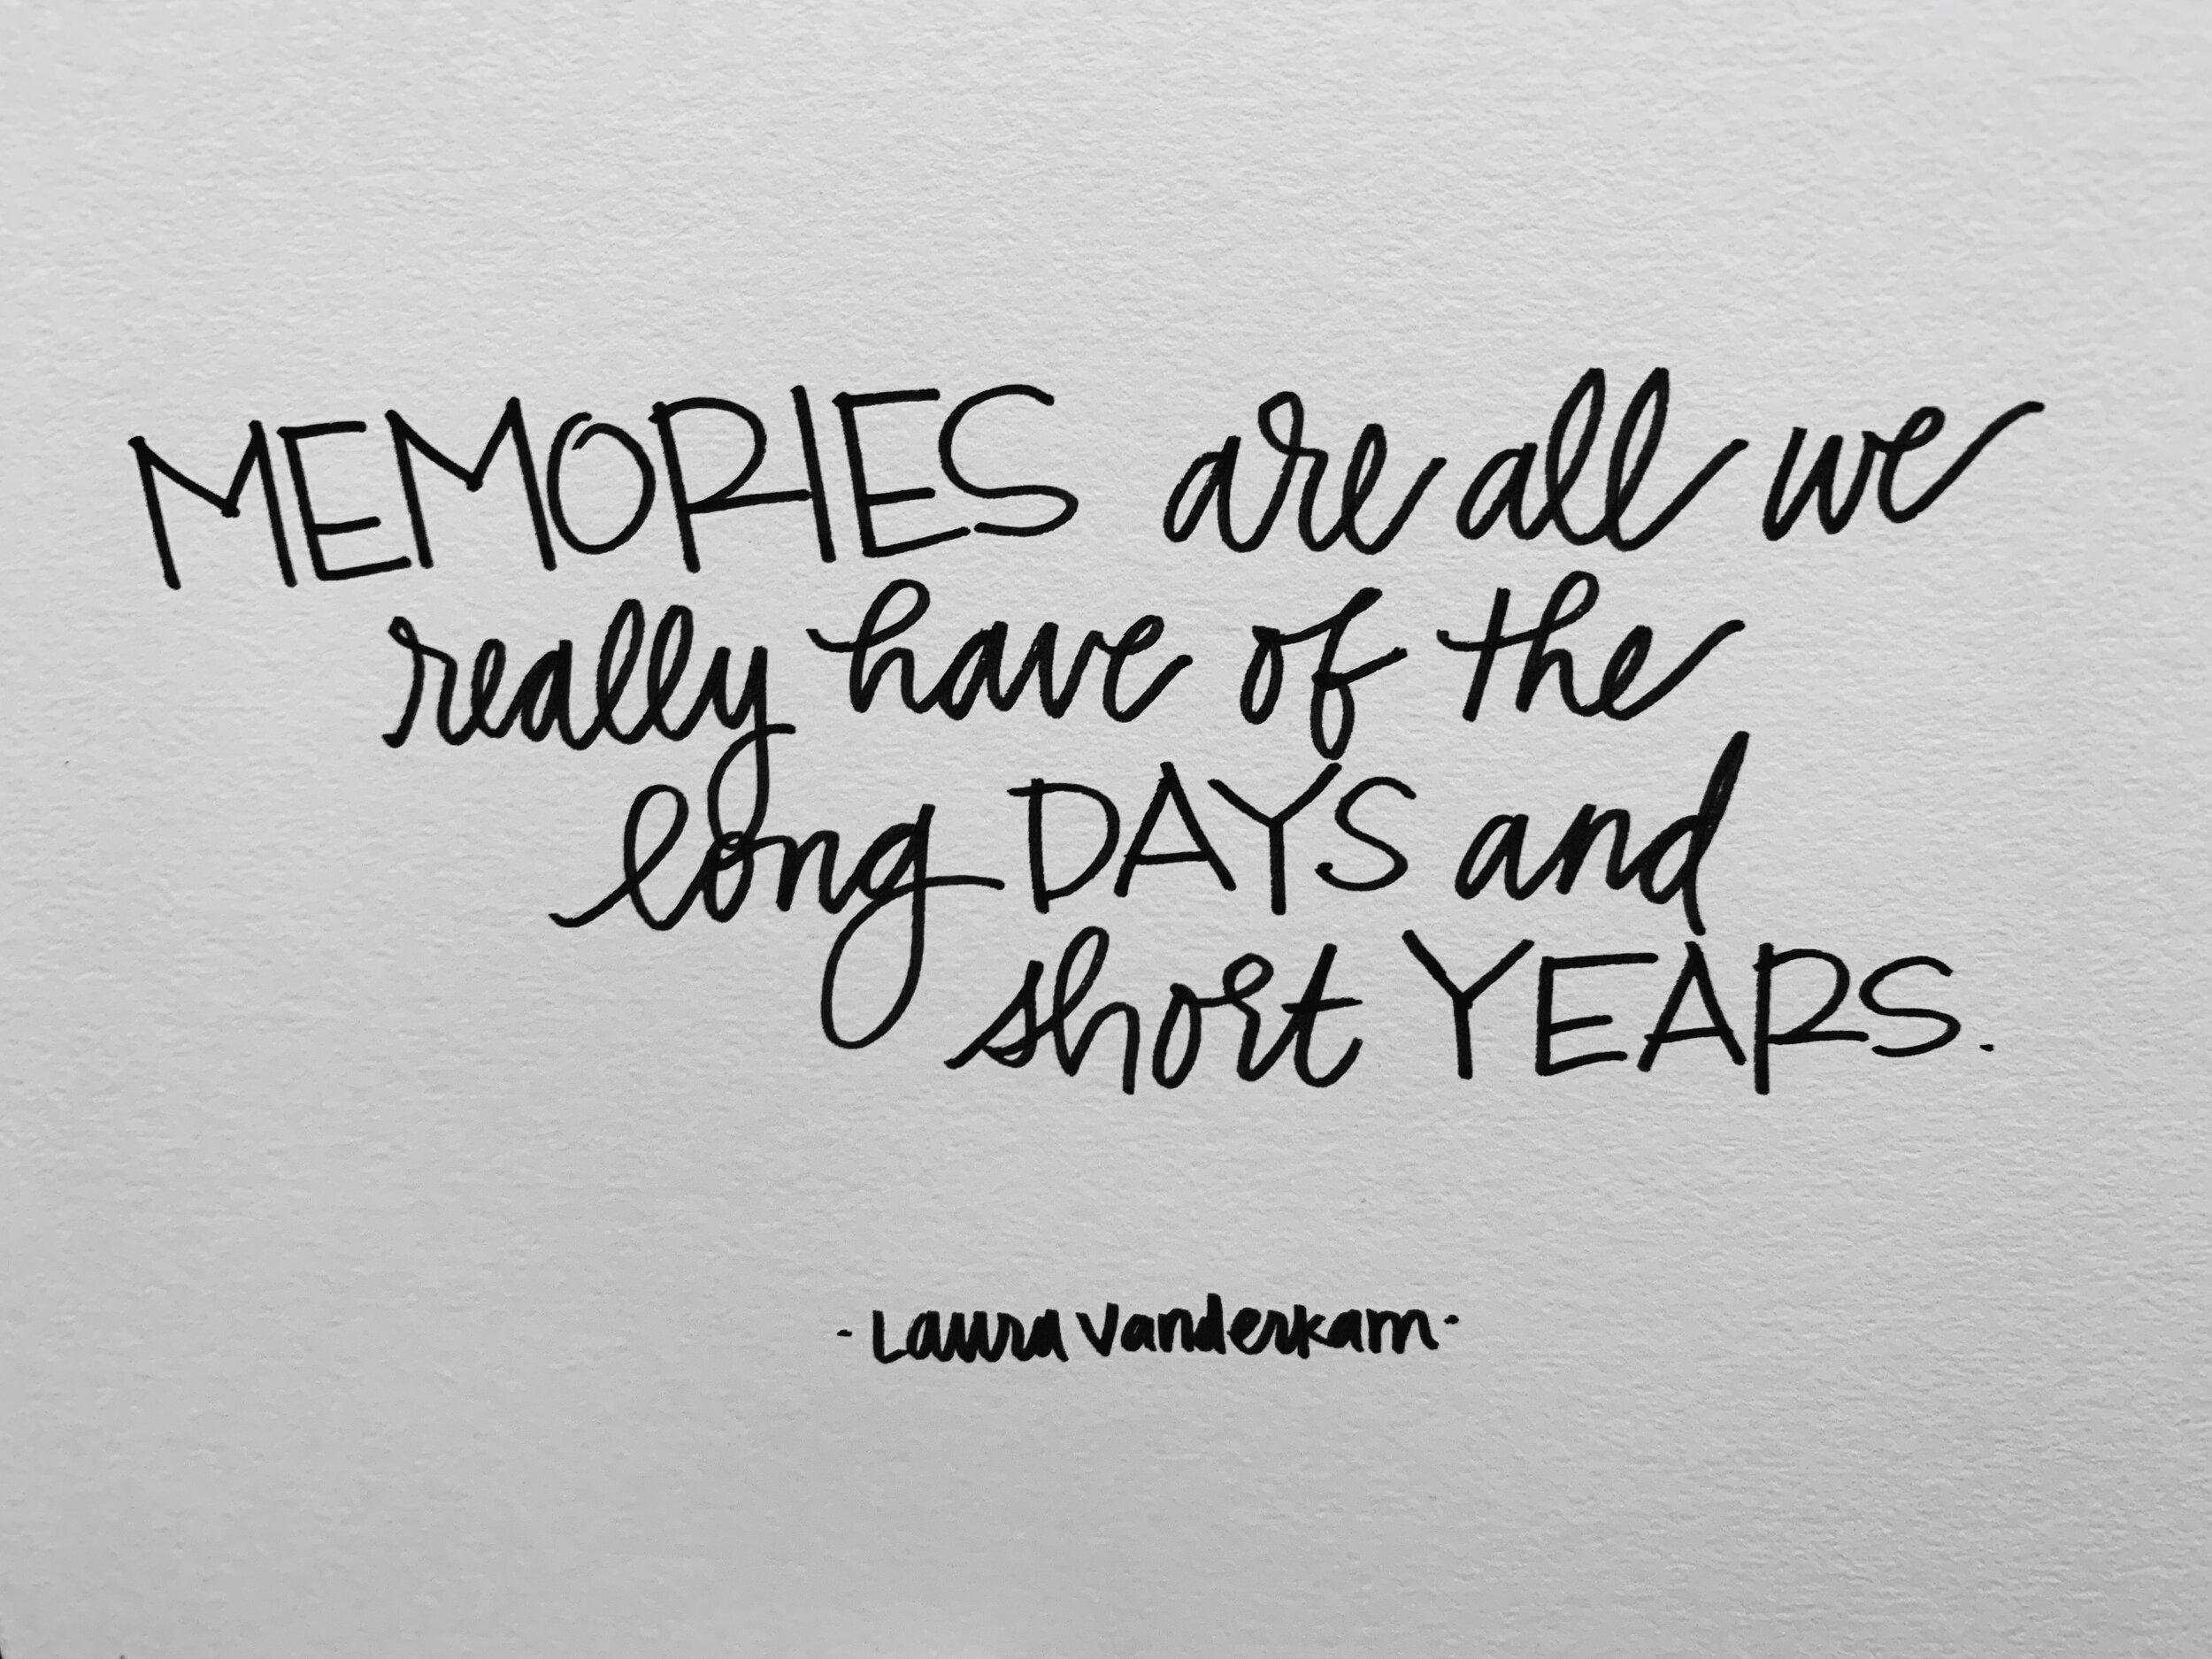 kdelap_memories